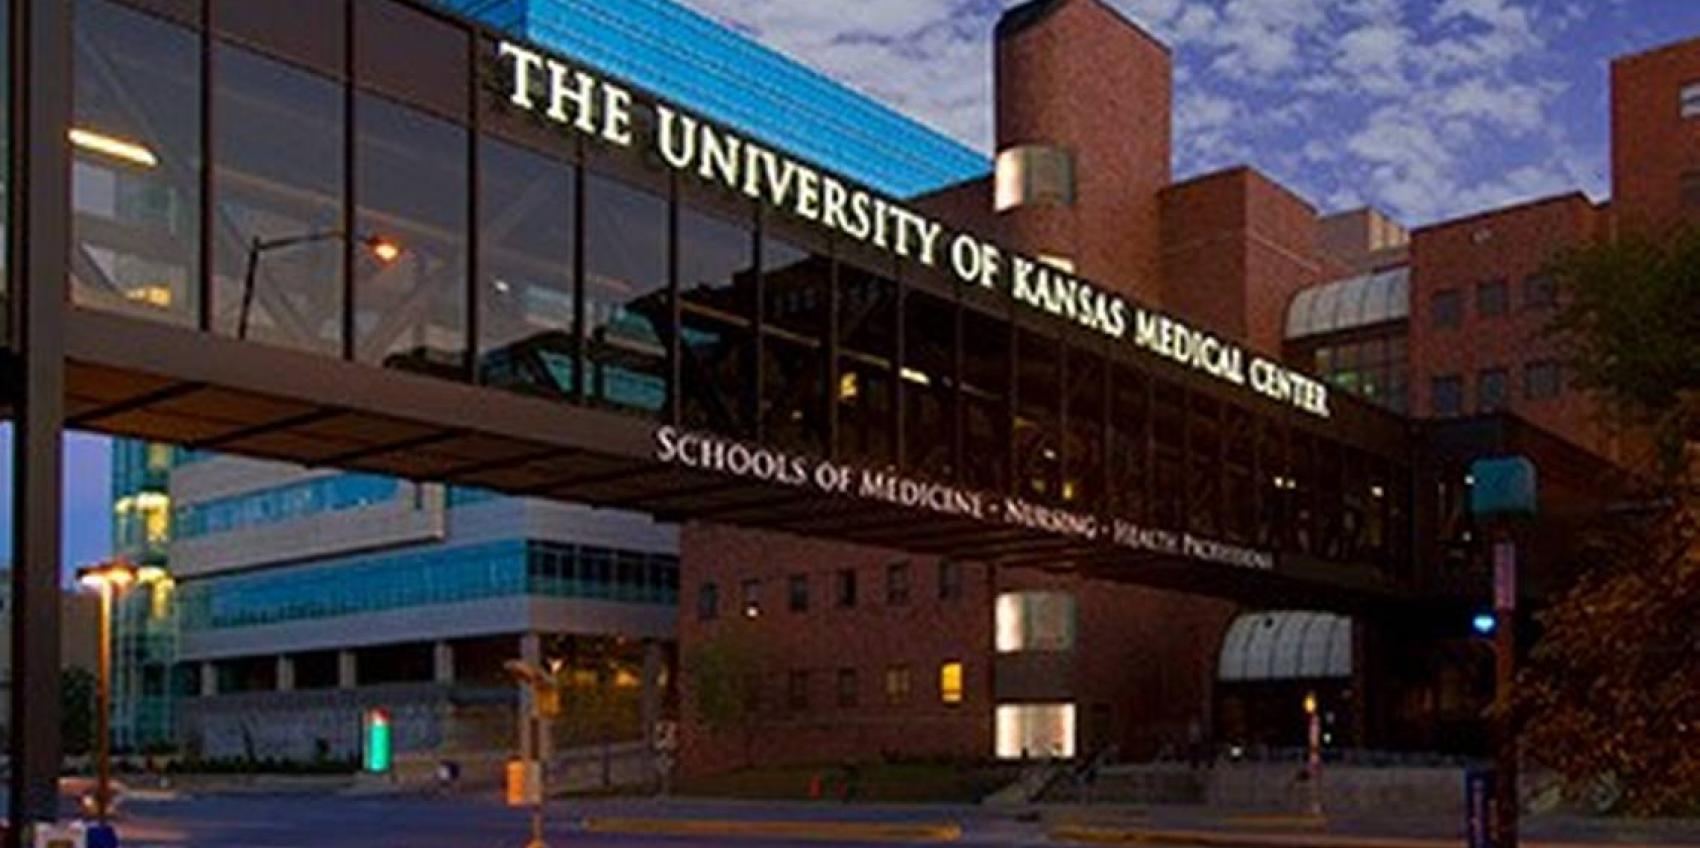 University Of Kansas Medical Center American Public